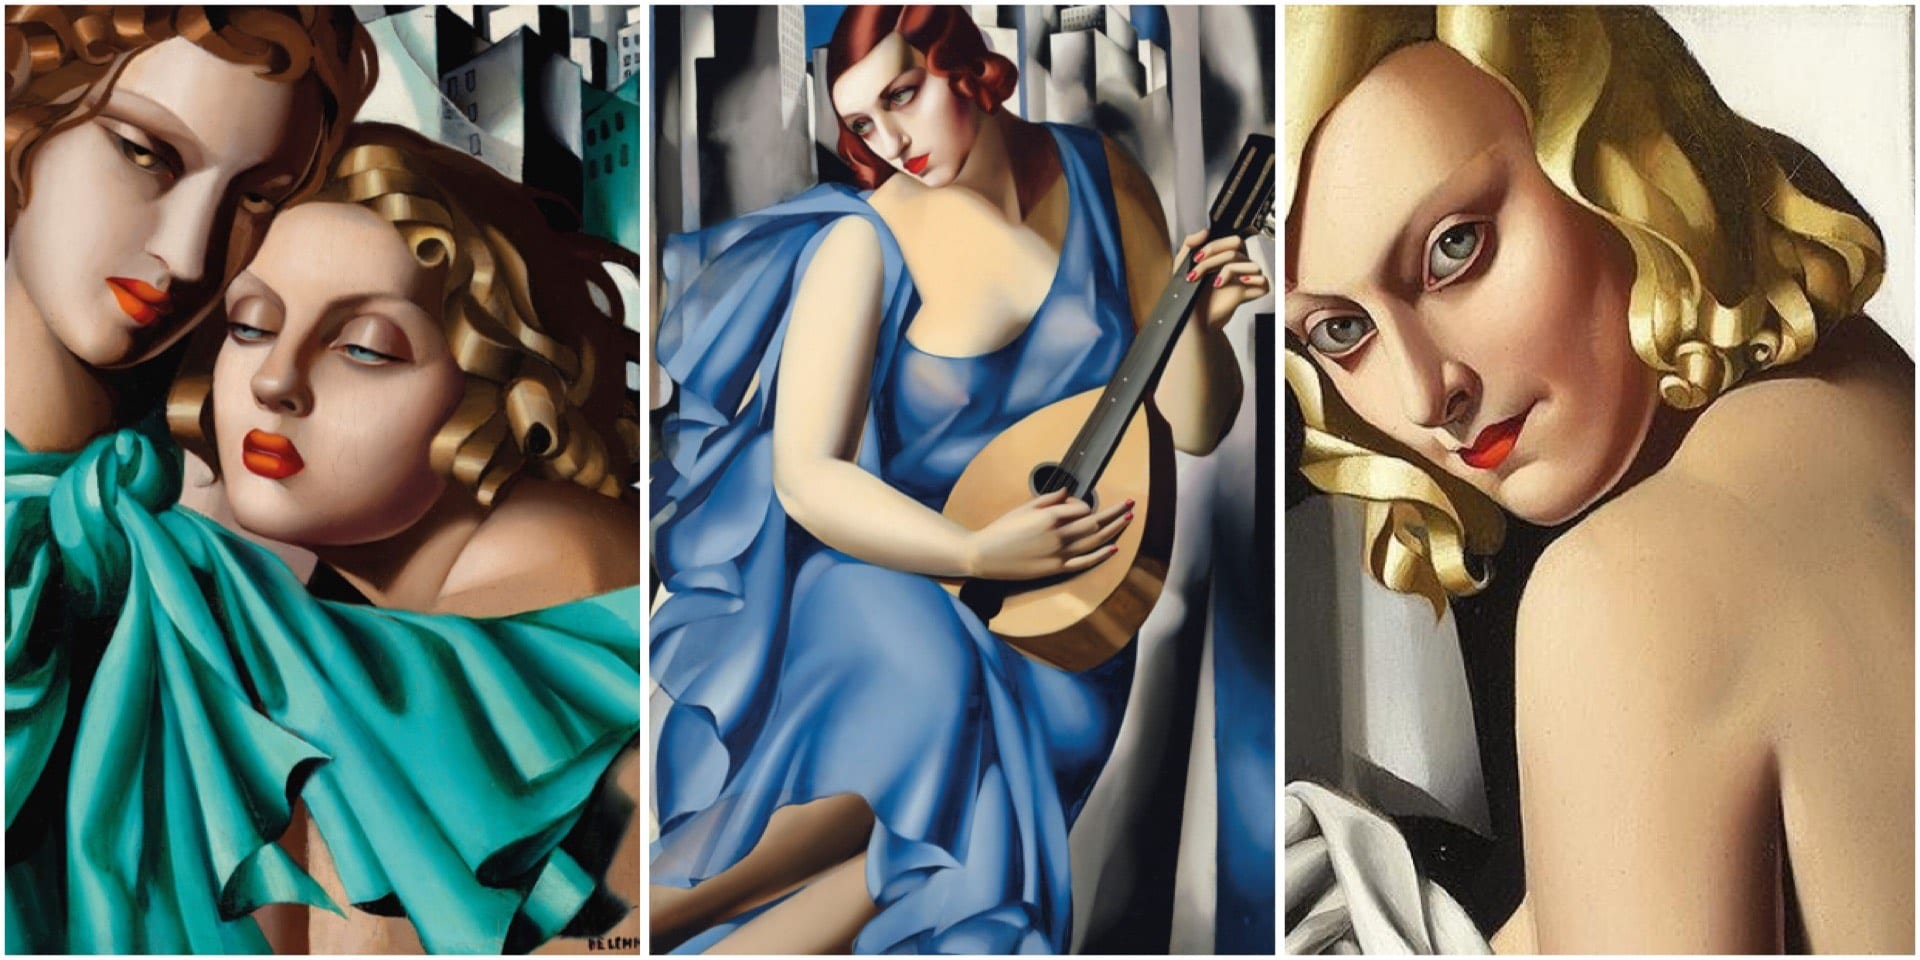 Картина Тамары Де Лемпицки продана за рекордные 16.2 млн. фунтов